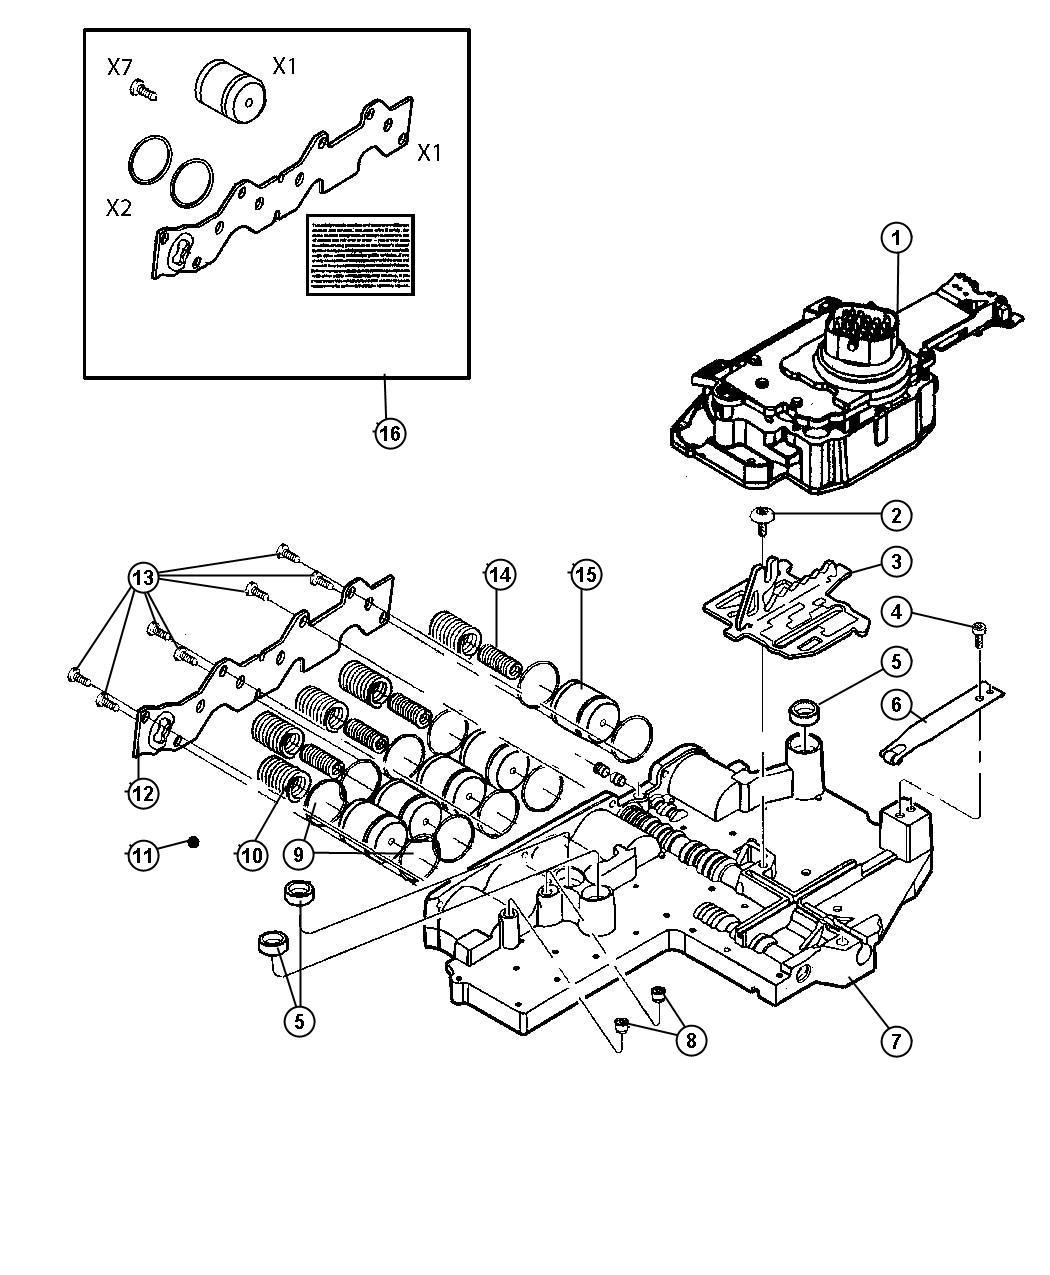 Dodge Ram Valve Body 45rfe Transmission 5 Spd